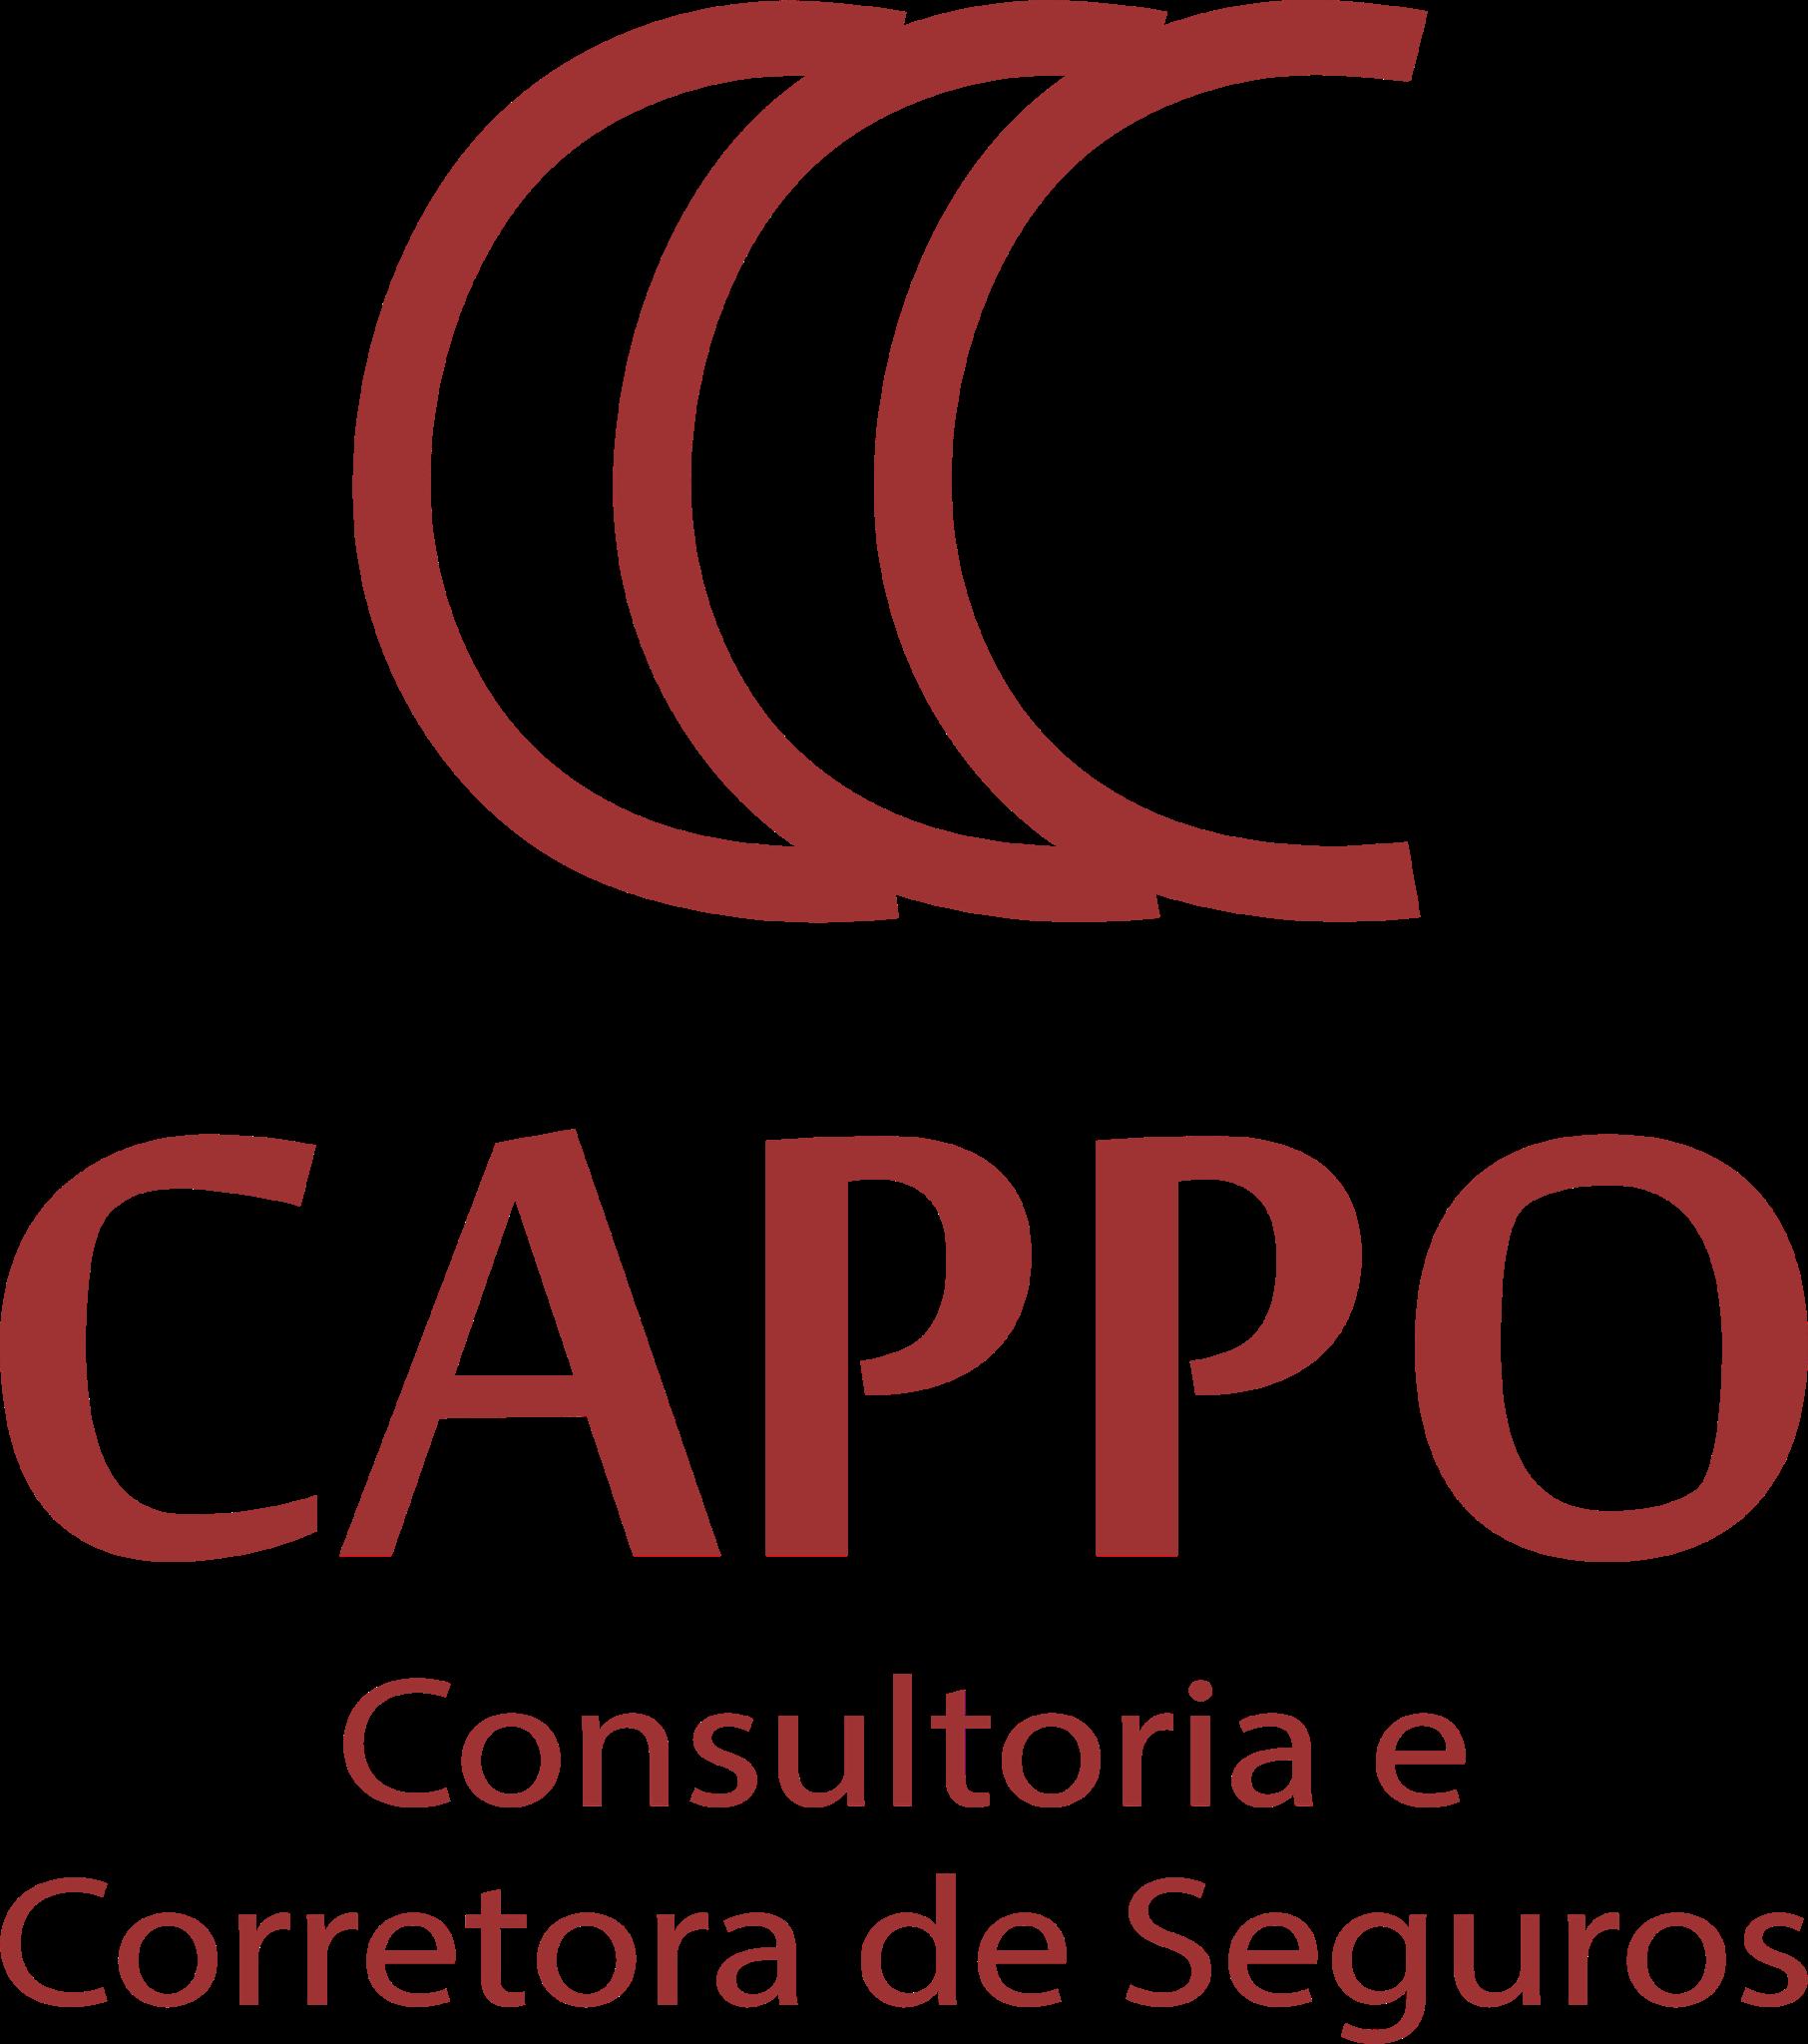 Cappo_curvas_sem_fundo.png